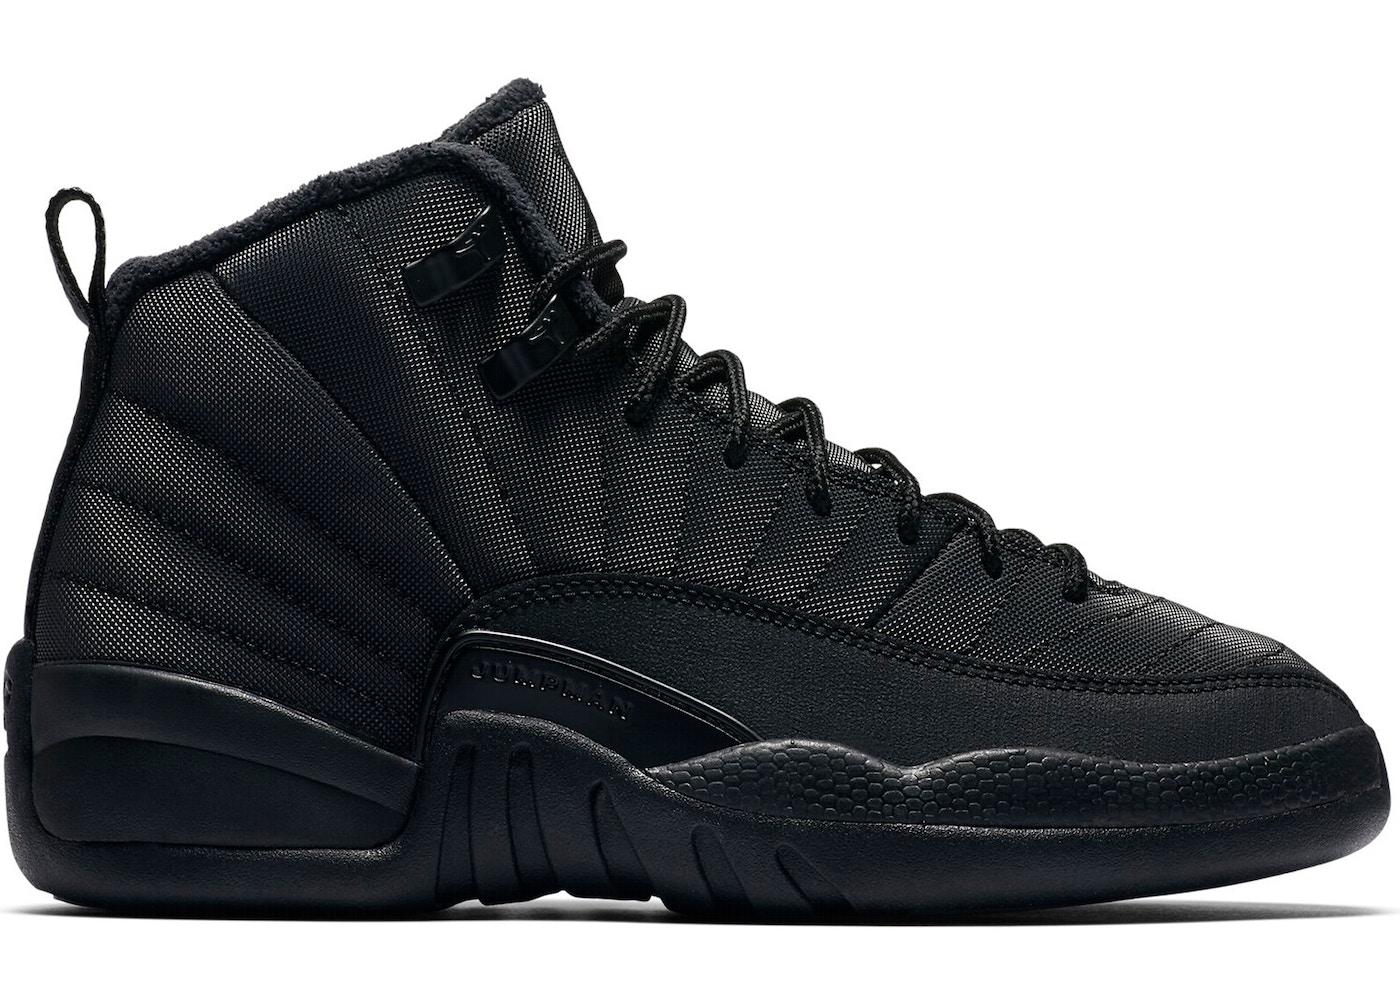 52955506cf8 View All Bids. Jordan 12 Retro Winter Black (GS). Black (GS)